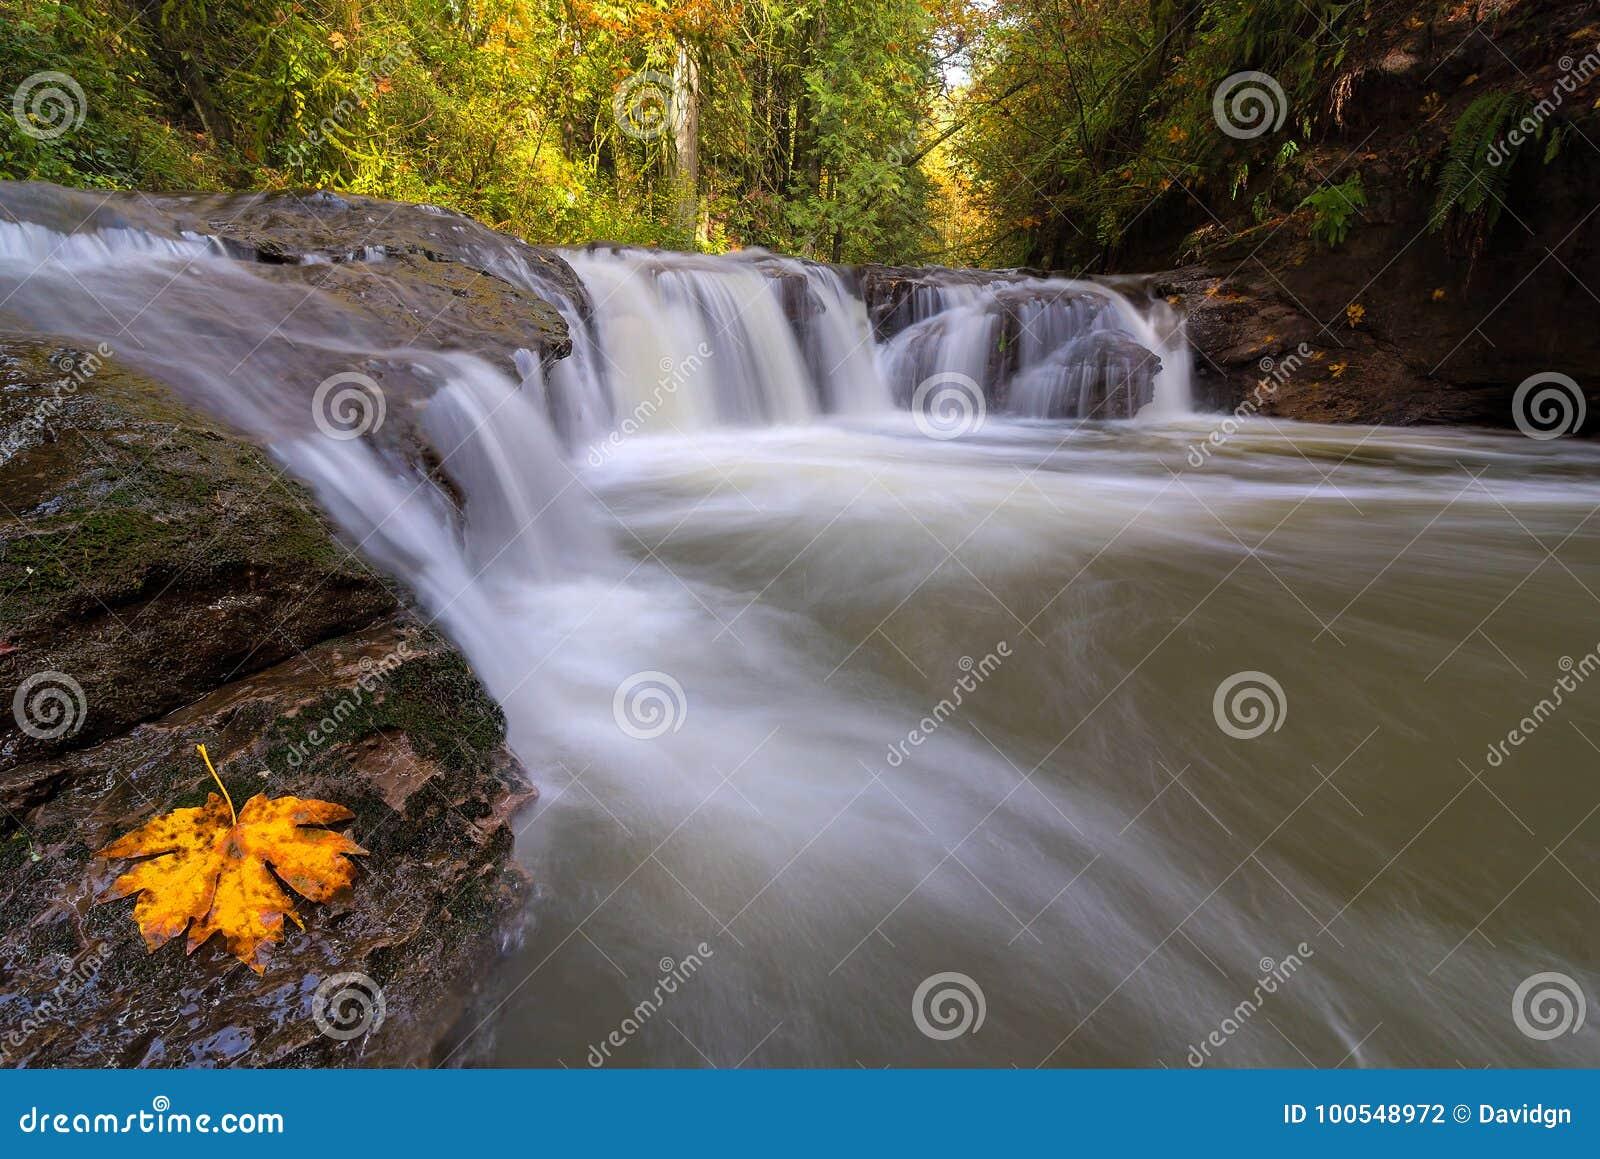 Rock Creek i den lyckliga dalen Oregon USA